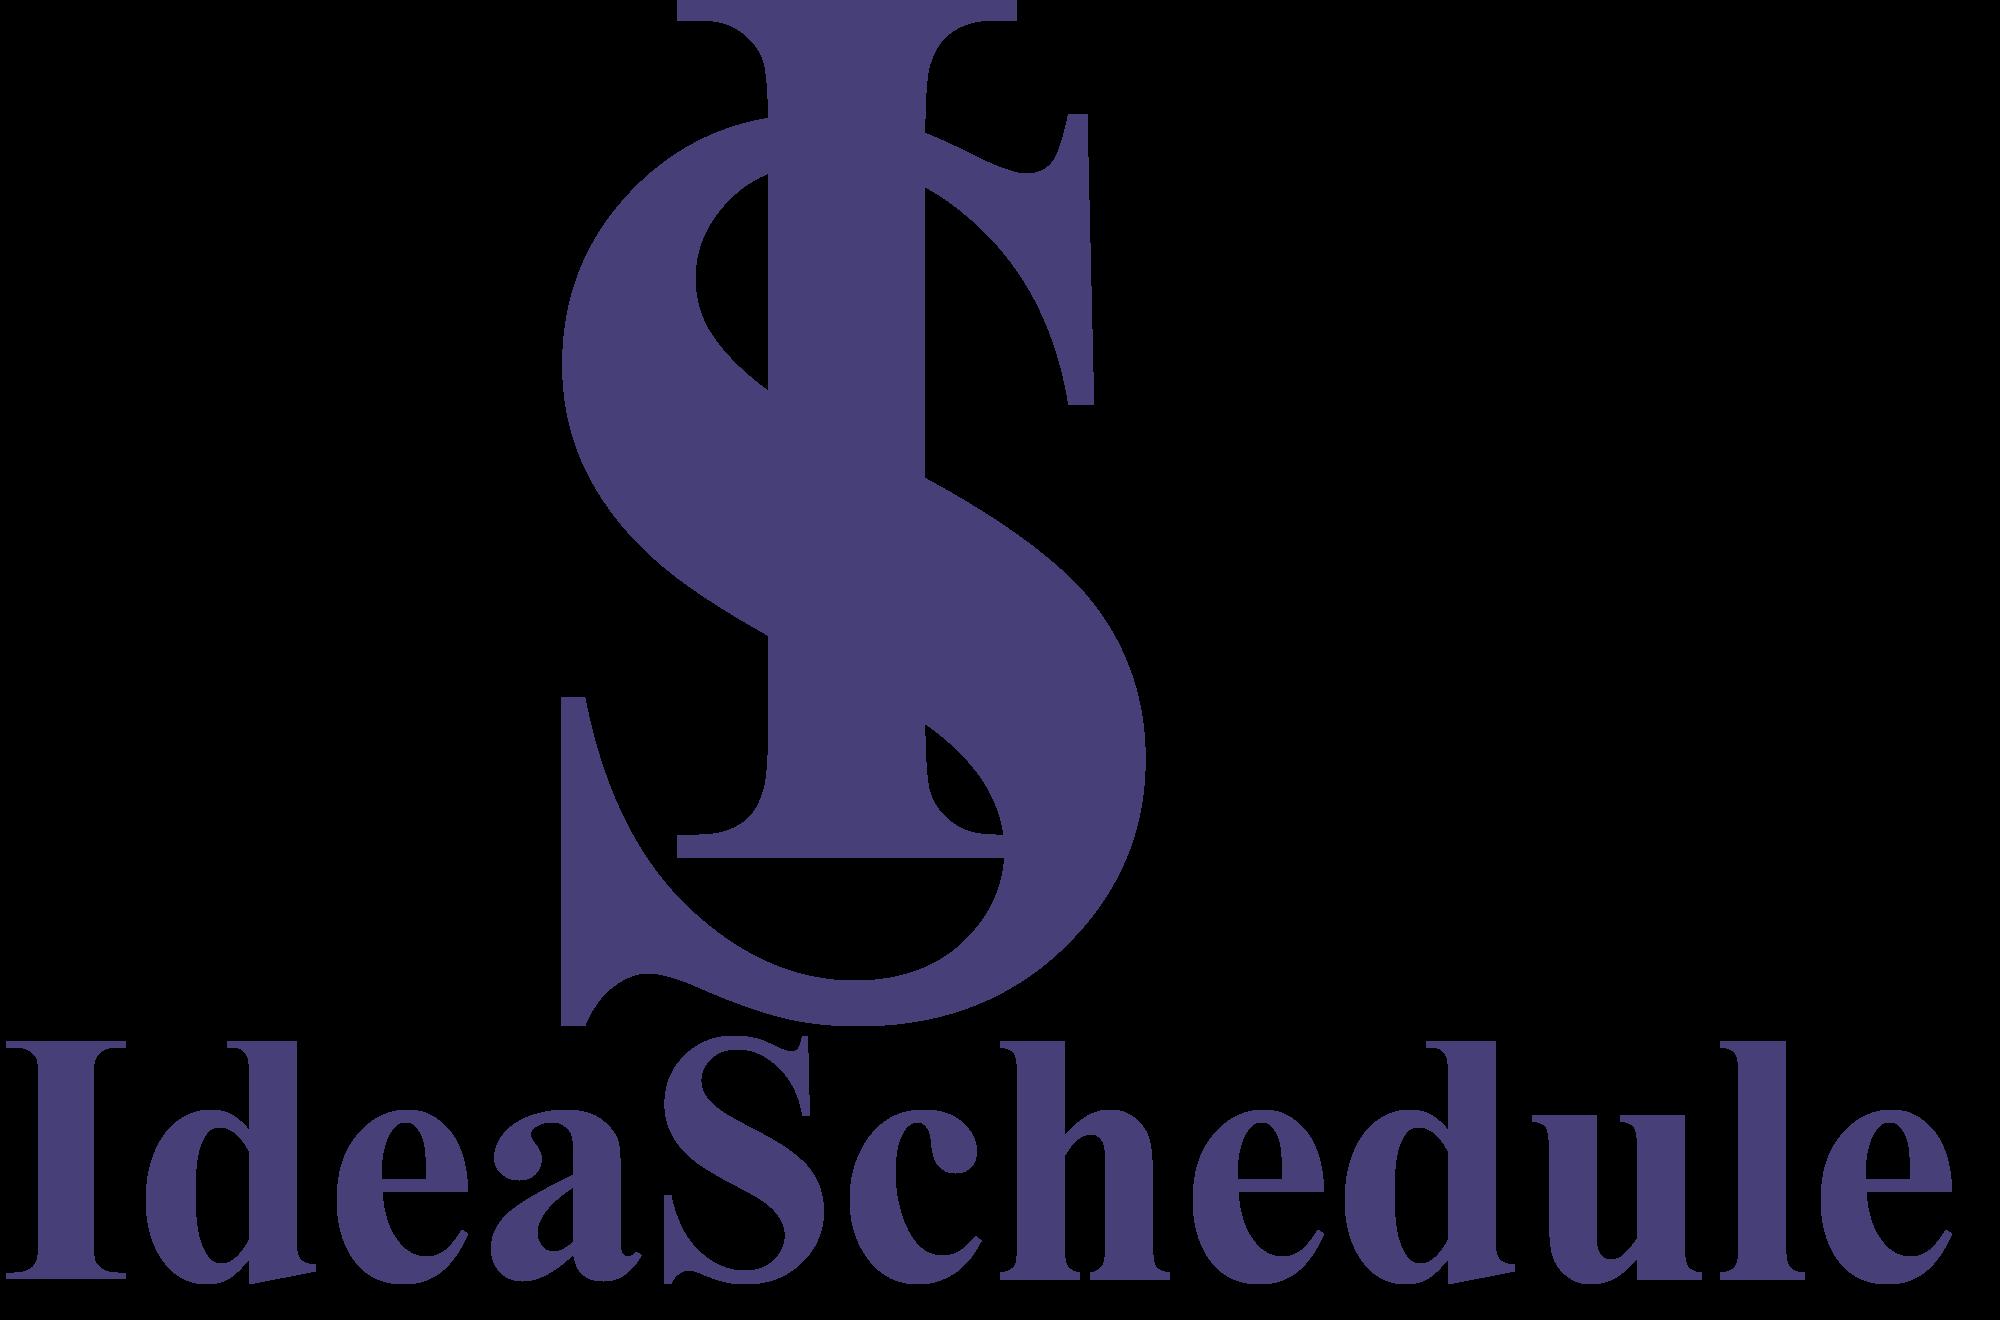 IdeaSchedule